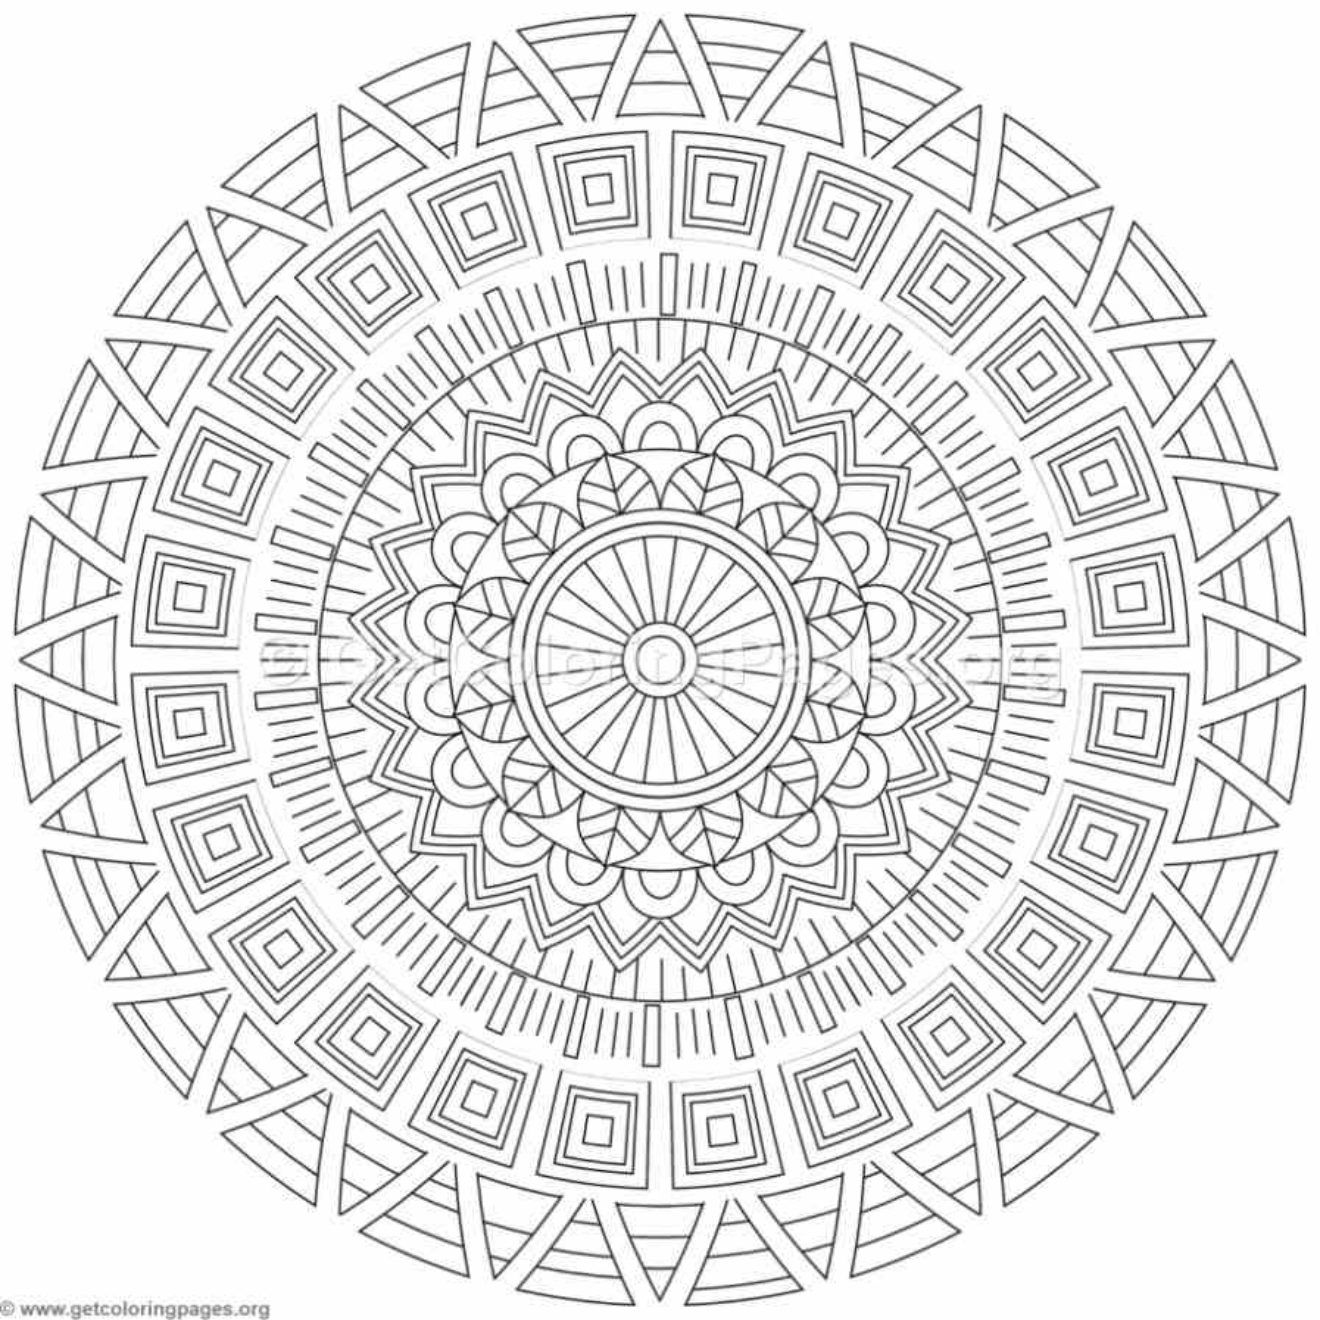 Tribal Mandala Coloring Pages 132 Mandala Coloring Pages Coloring Pages Mandala Coloring